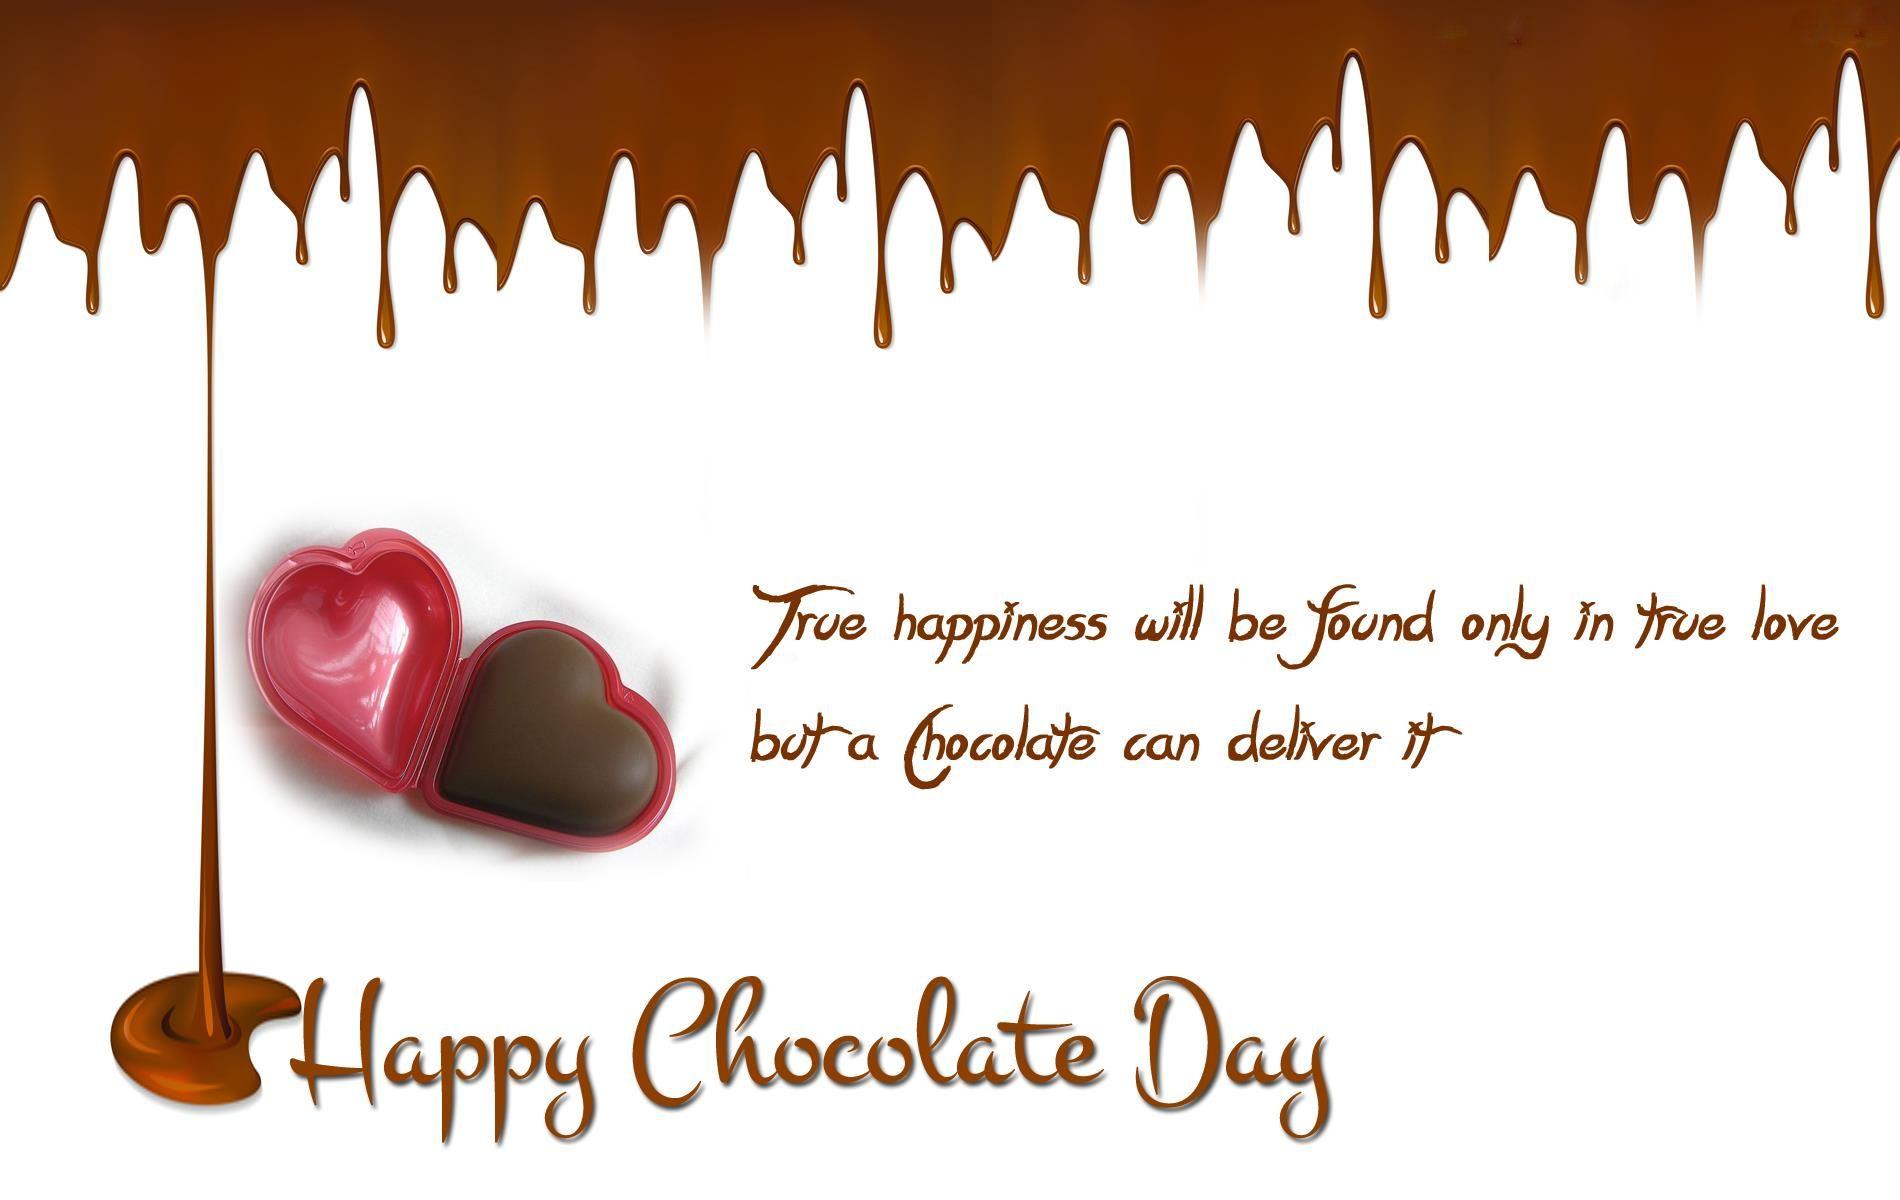 Happy Chocolate Day Happychocolateday Valentinedayweek Sollunaresort Happy Chocolate Day Happy Propose Day Image Happy Propose Day Happy chocolate day 2021 images shayri